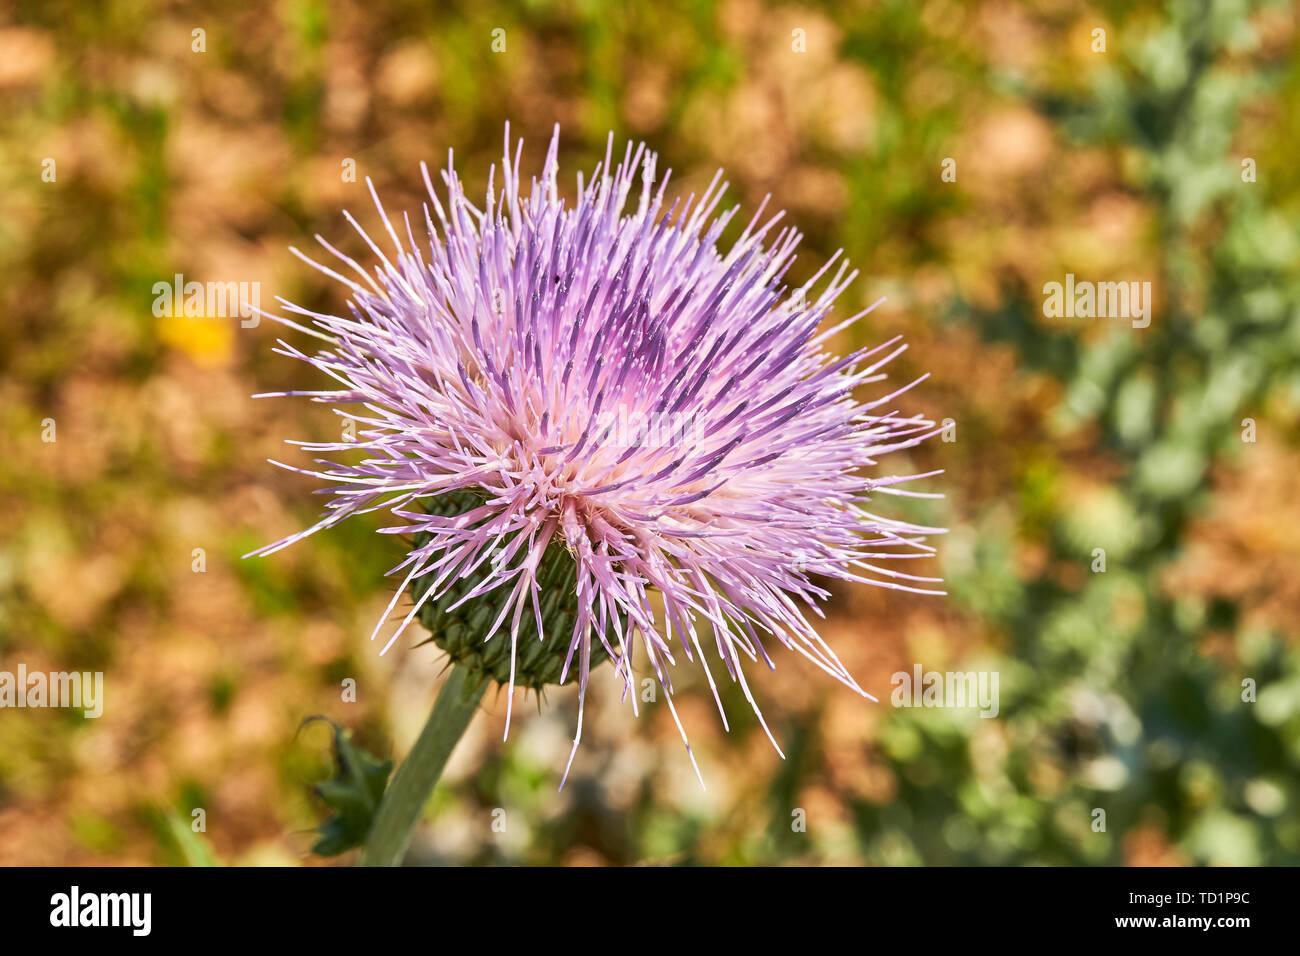 close-up-macro-of-isolated-beautiful-pink-texas-thistle-bloom-cirsium-texanum